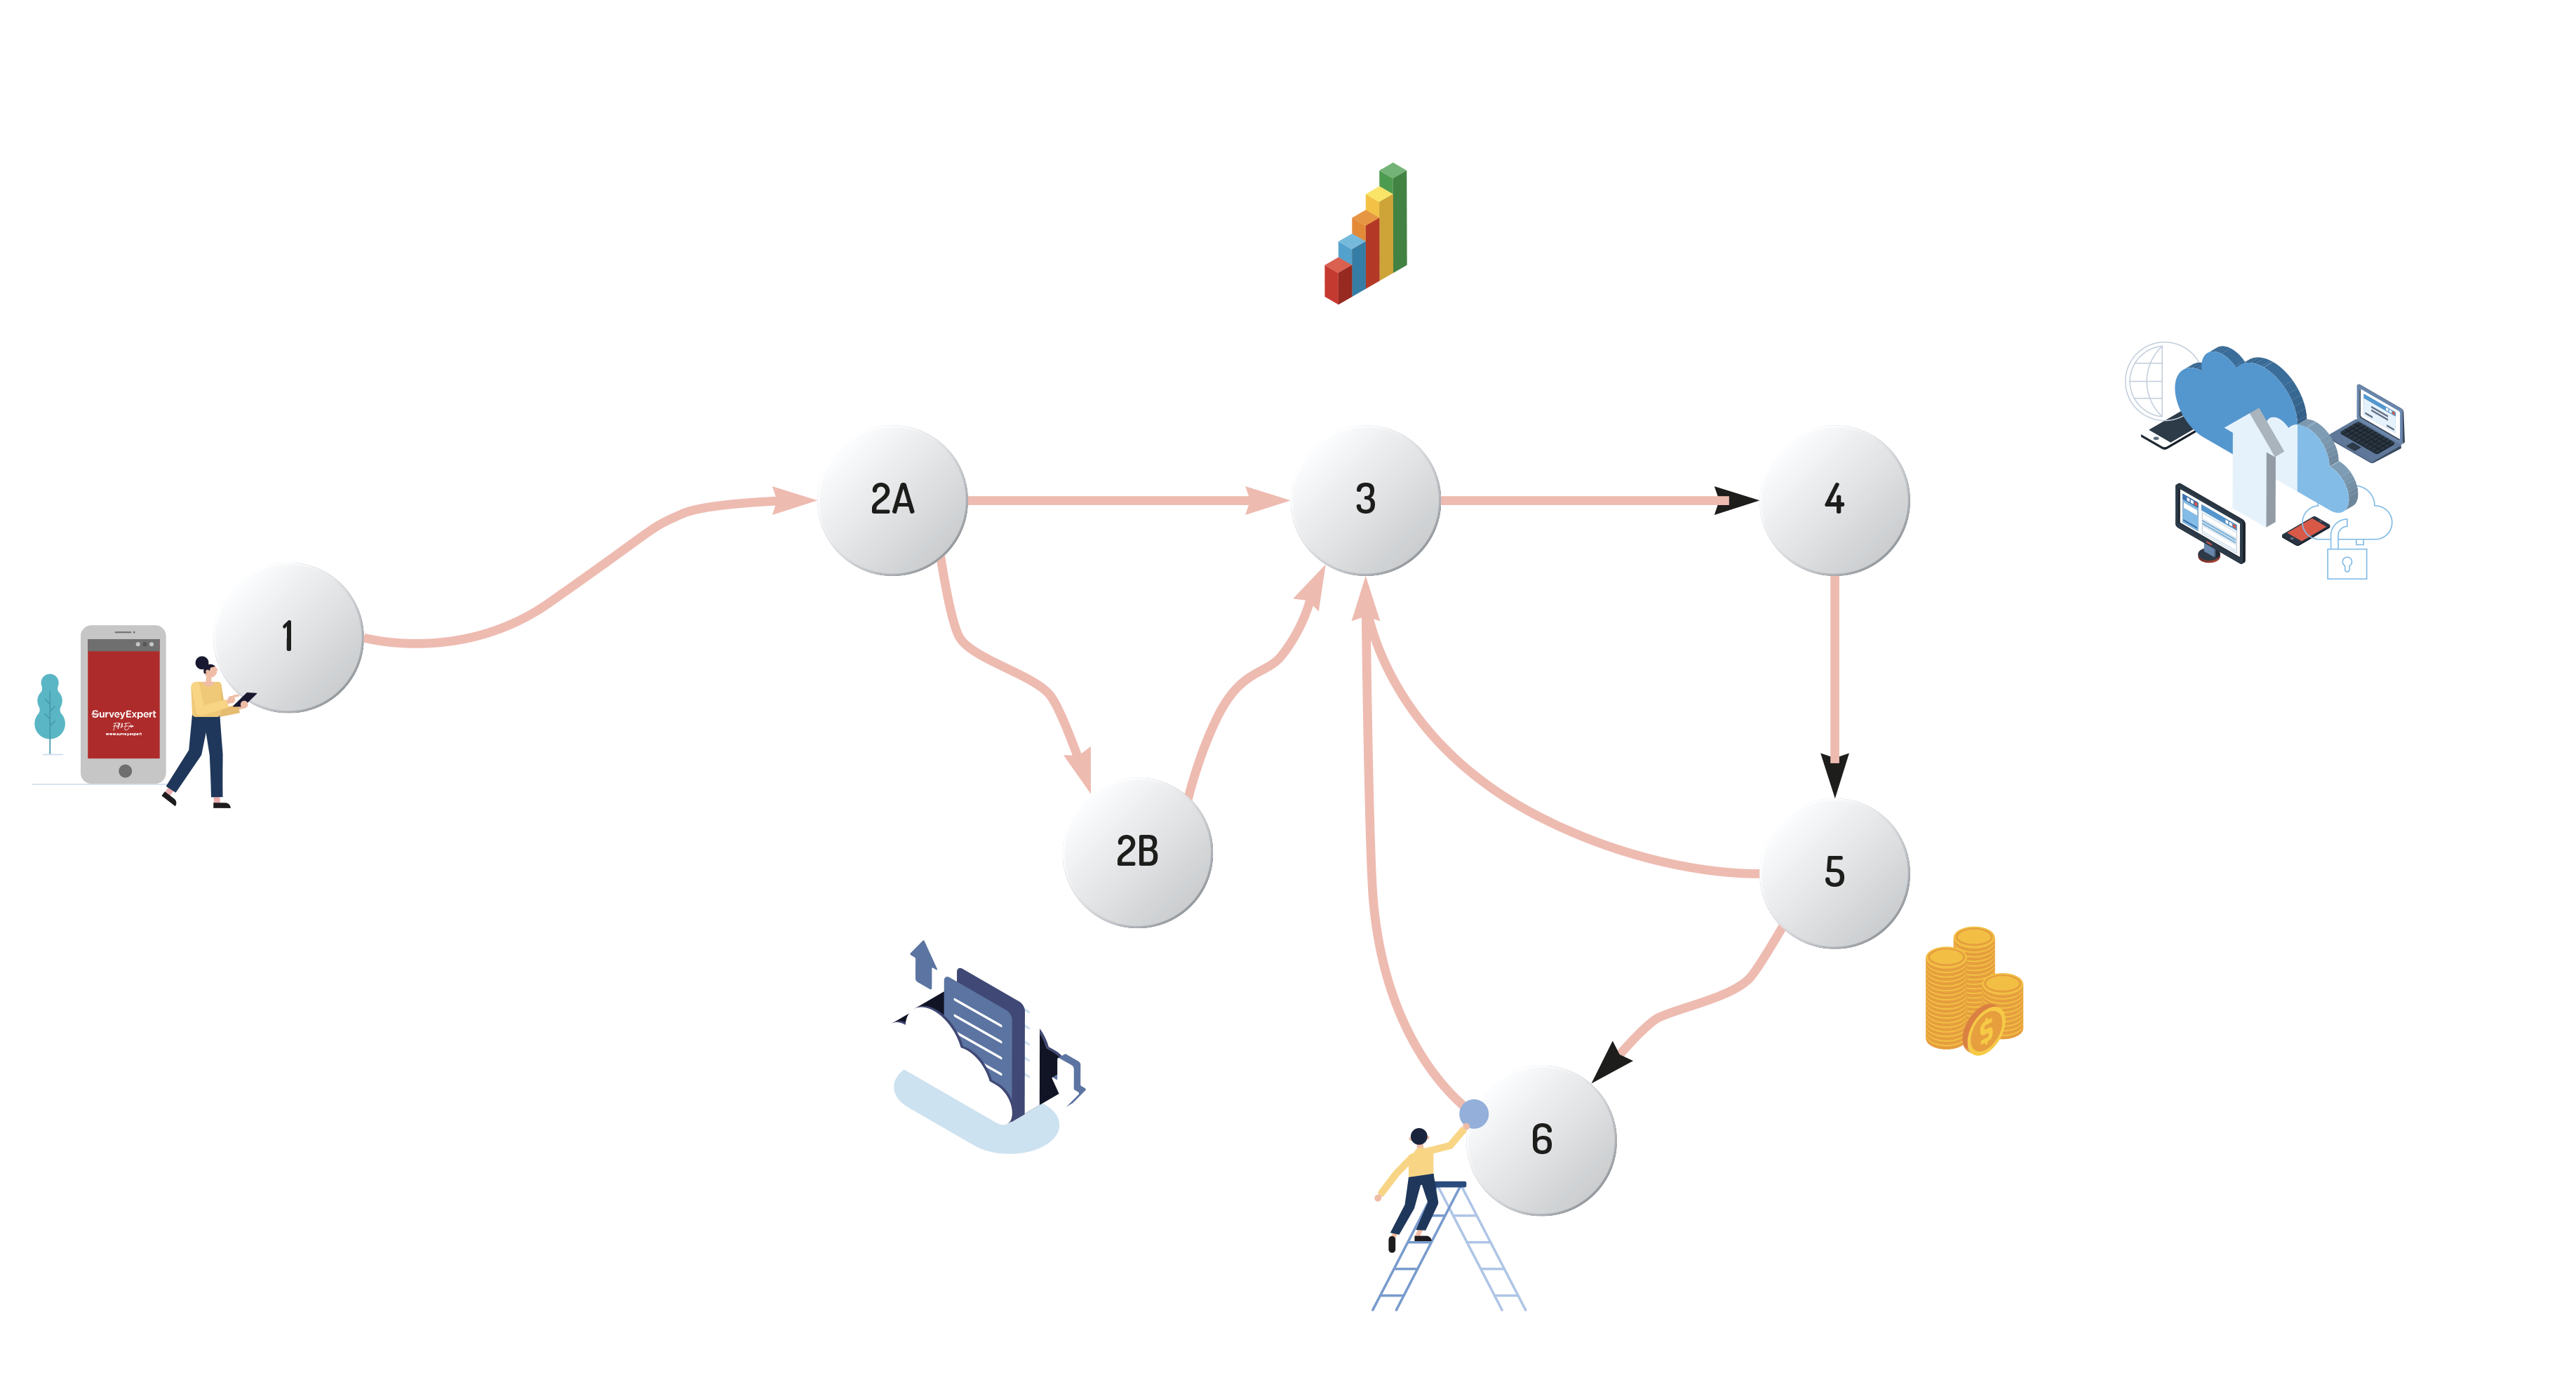 Participant State Diagram